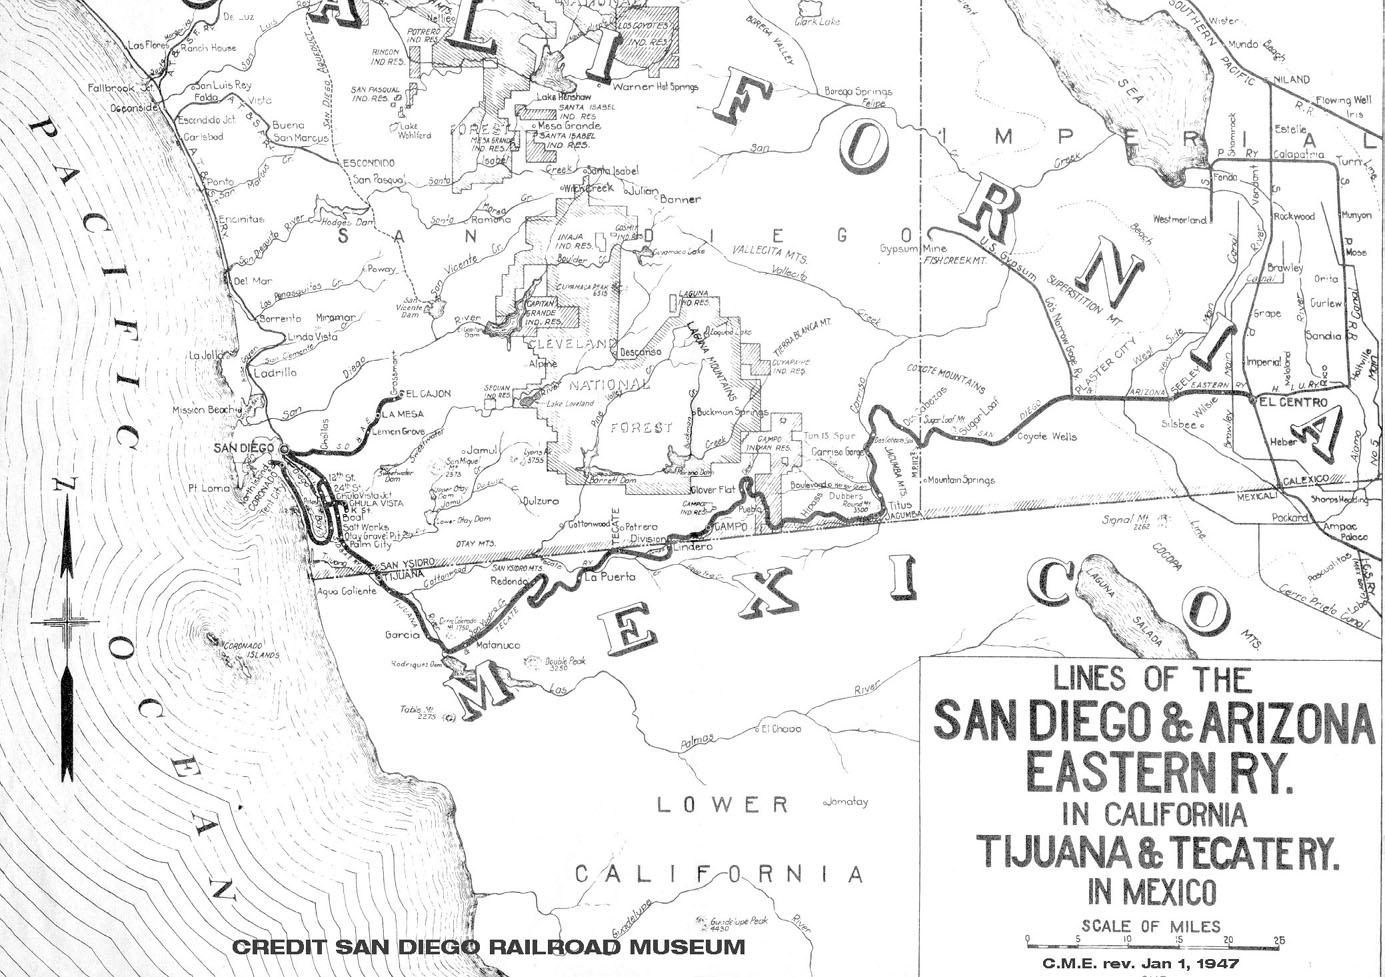 Sango And Arizona Railway Drawings